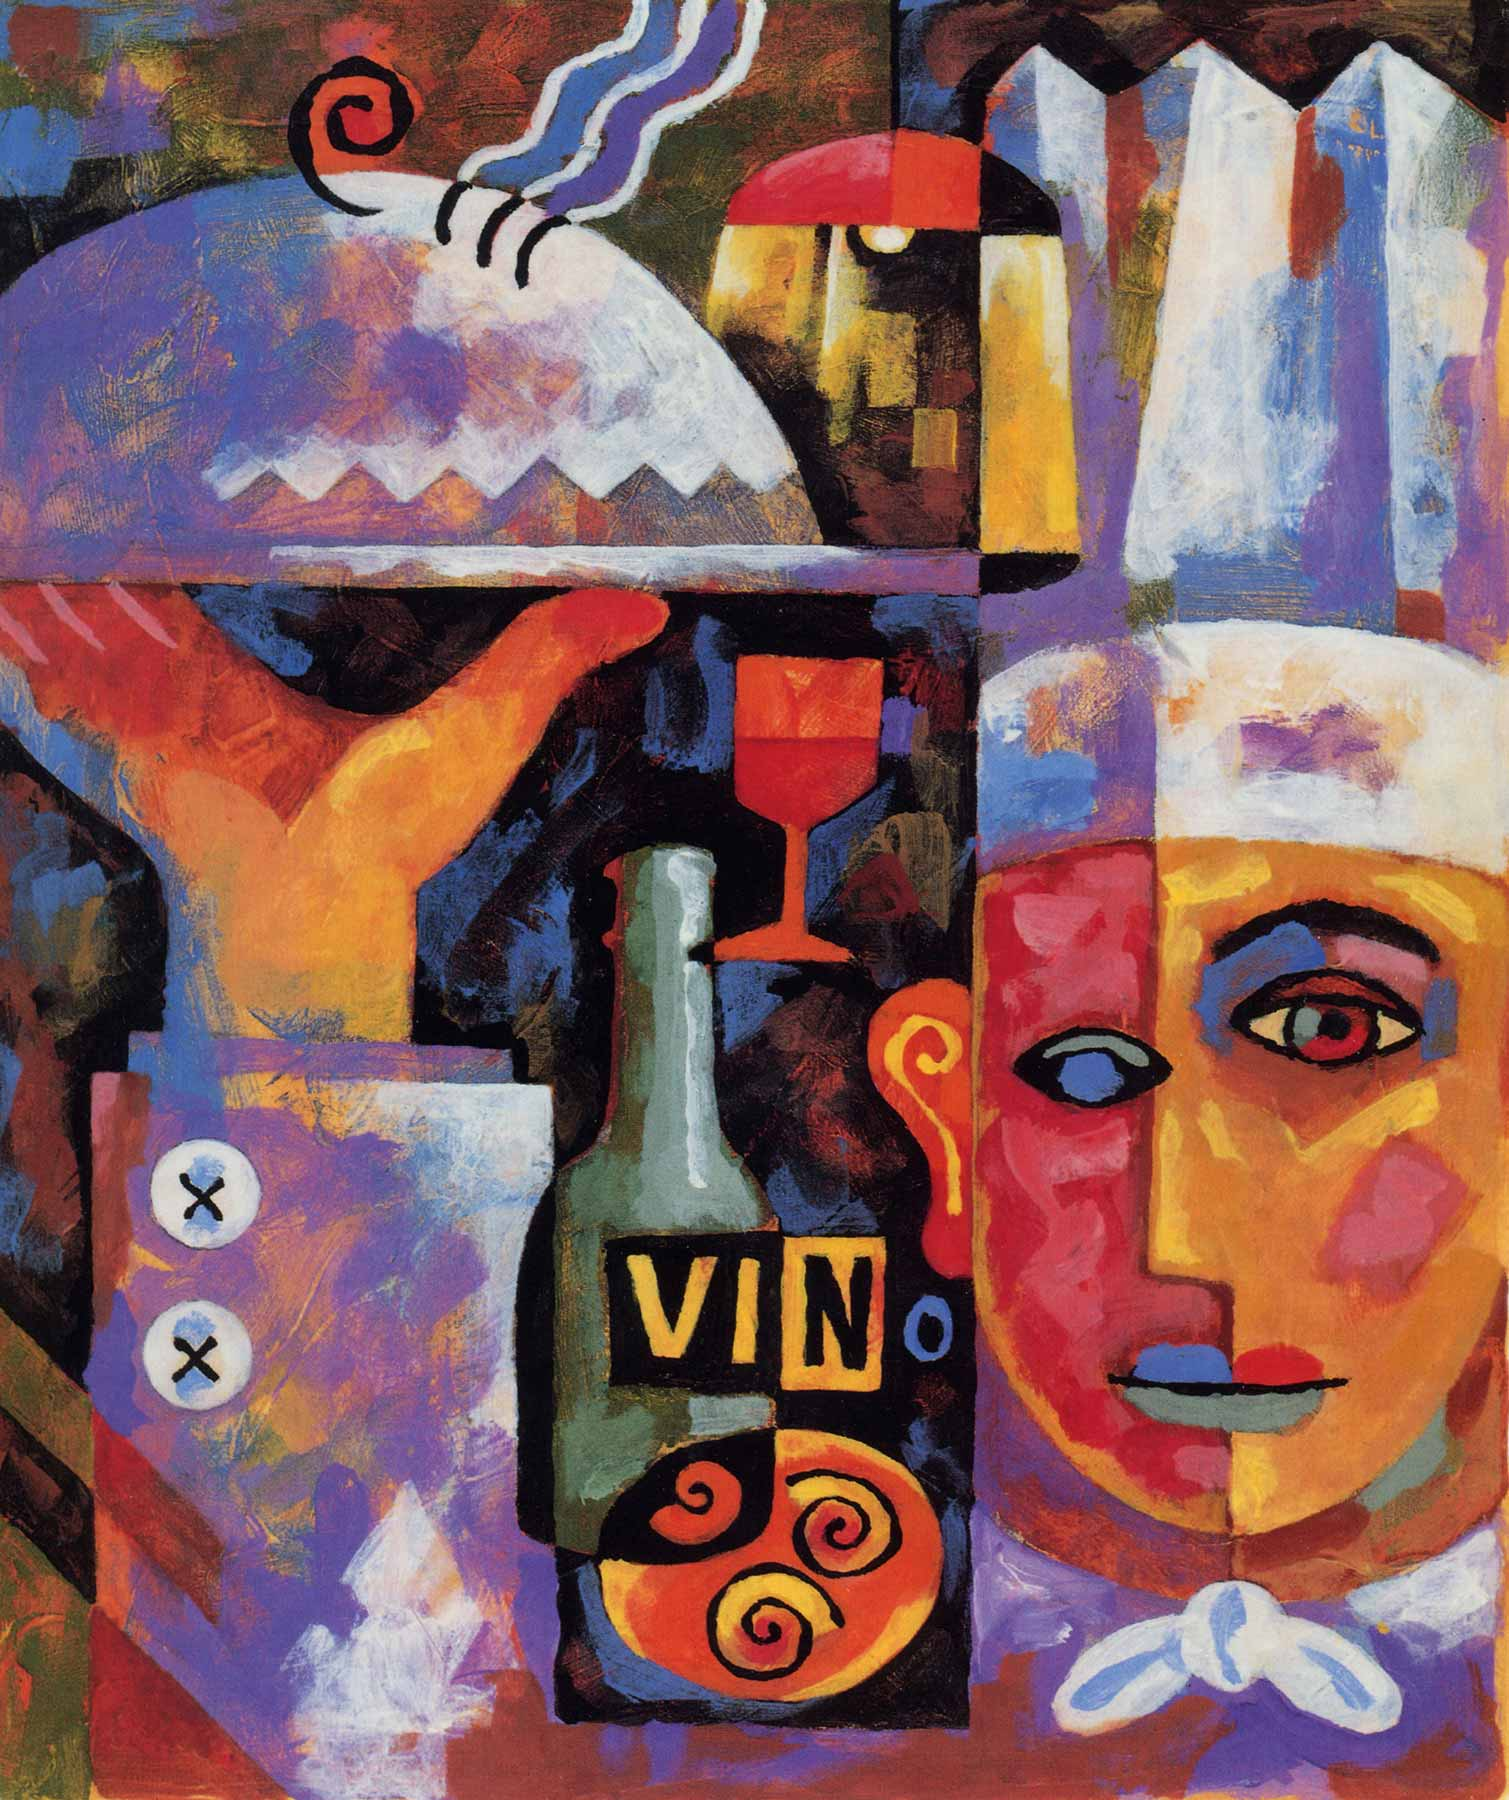 Jim Dryden / Le Chef / Taste of Nations Festival